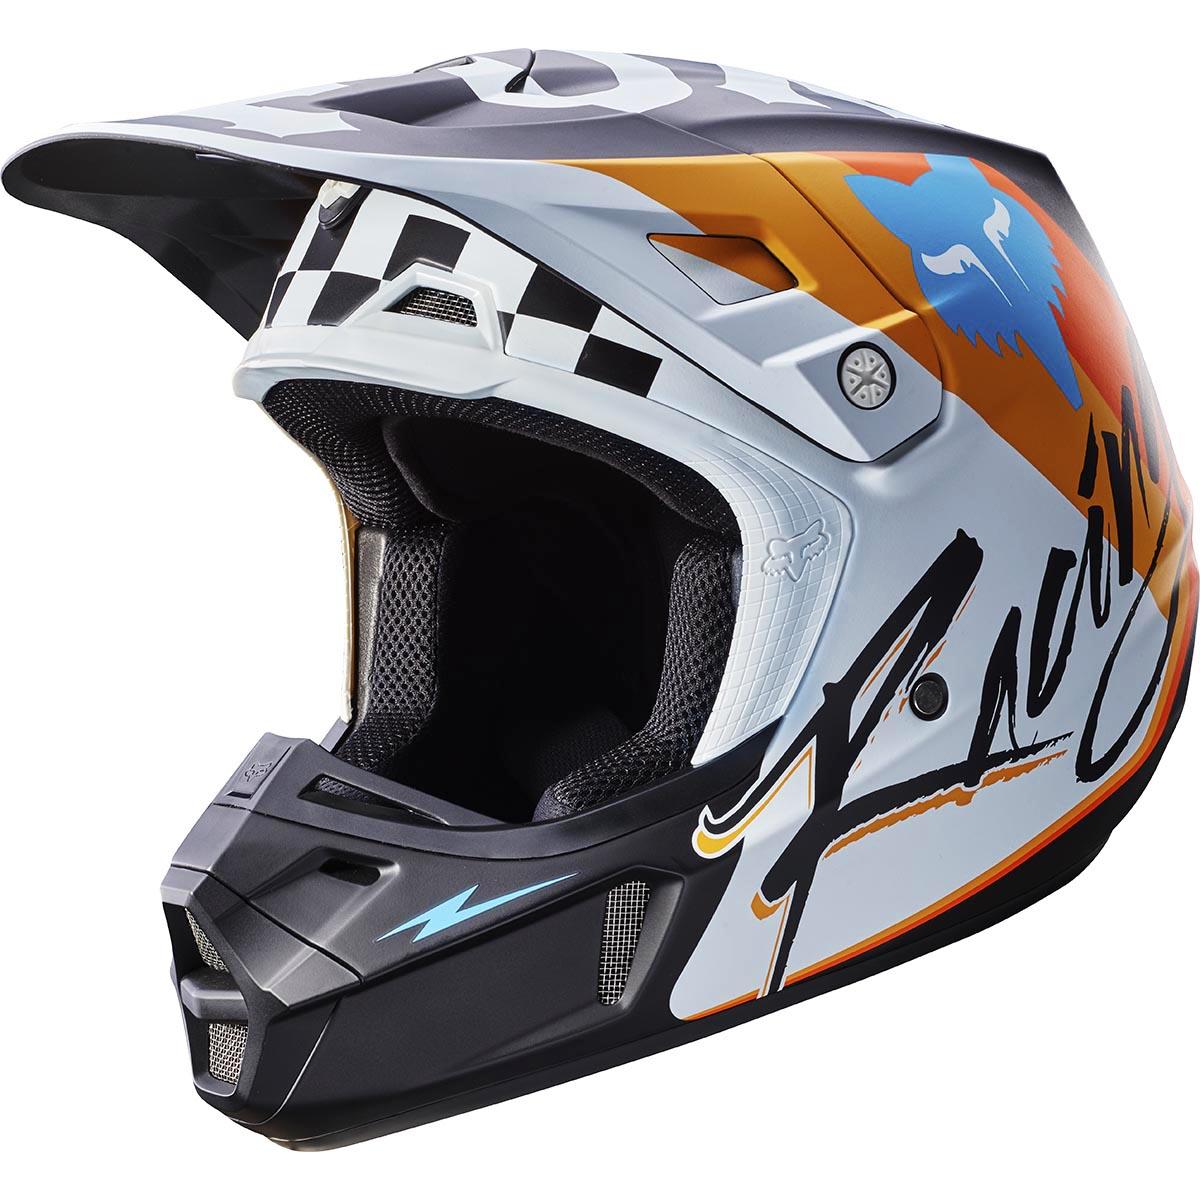 Fox - 2017 V2 Rohr шлем, белый